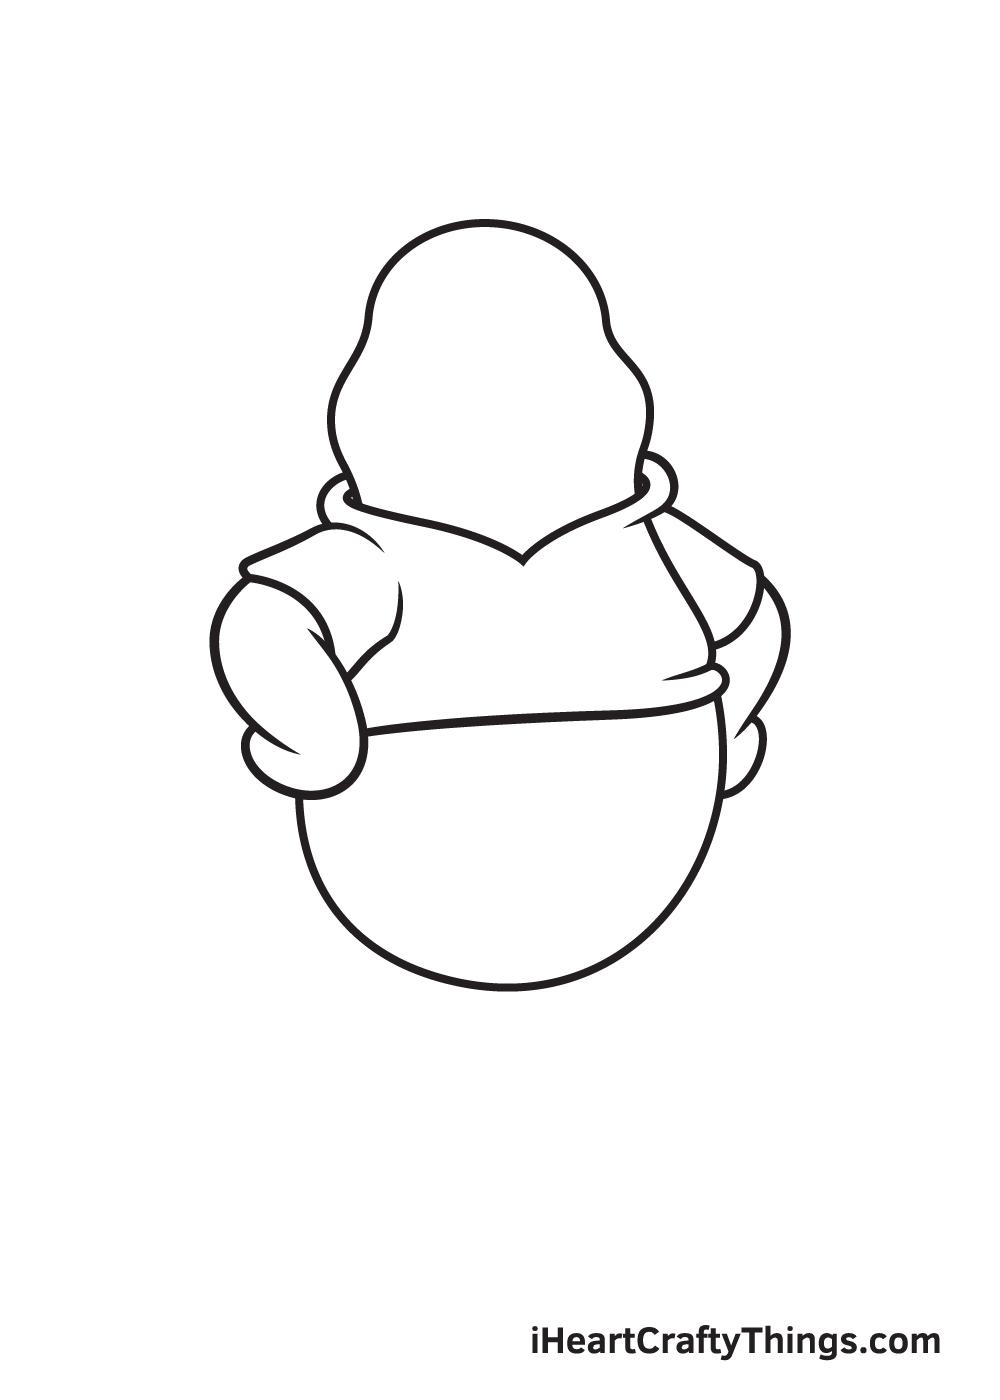 winnie the pooh drawing step 6